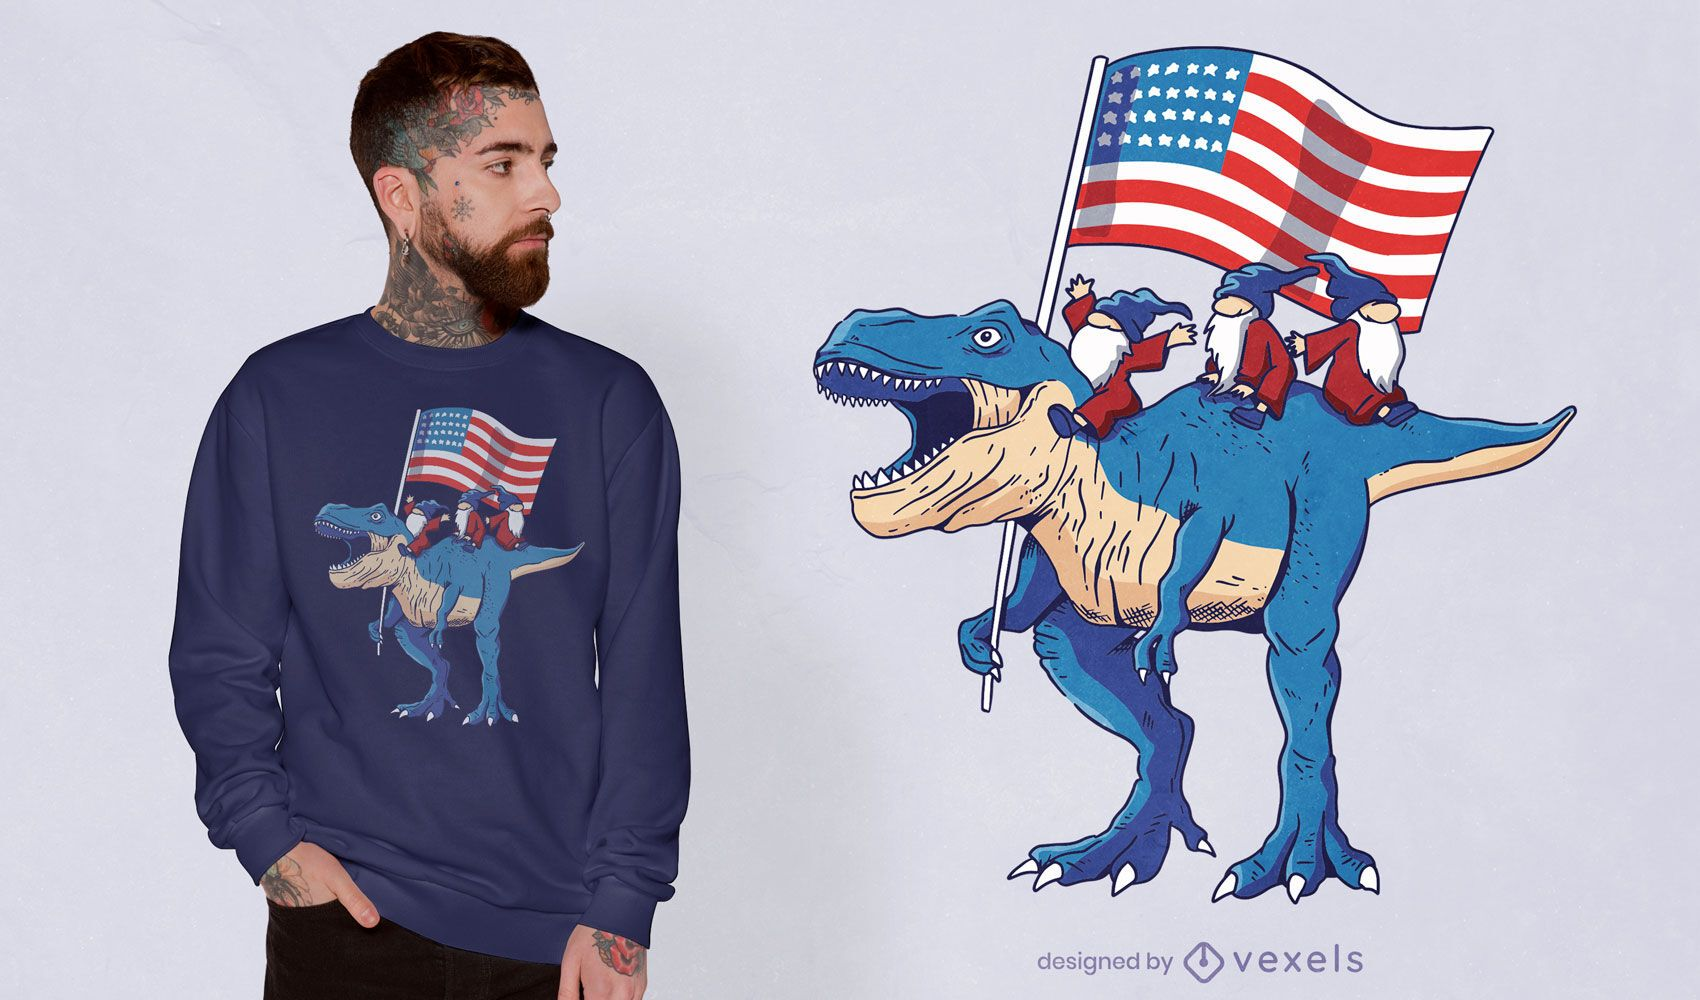 Gnomos montando dise?o de camiseta de dinosaurio t-rex.